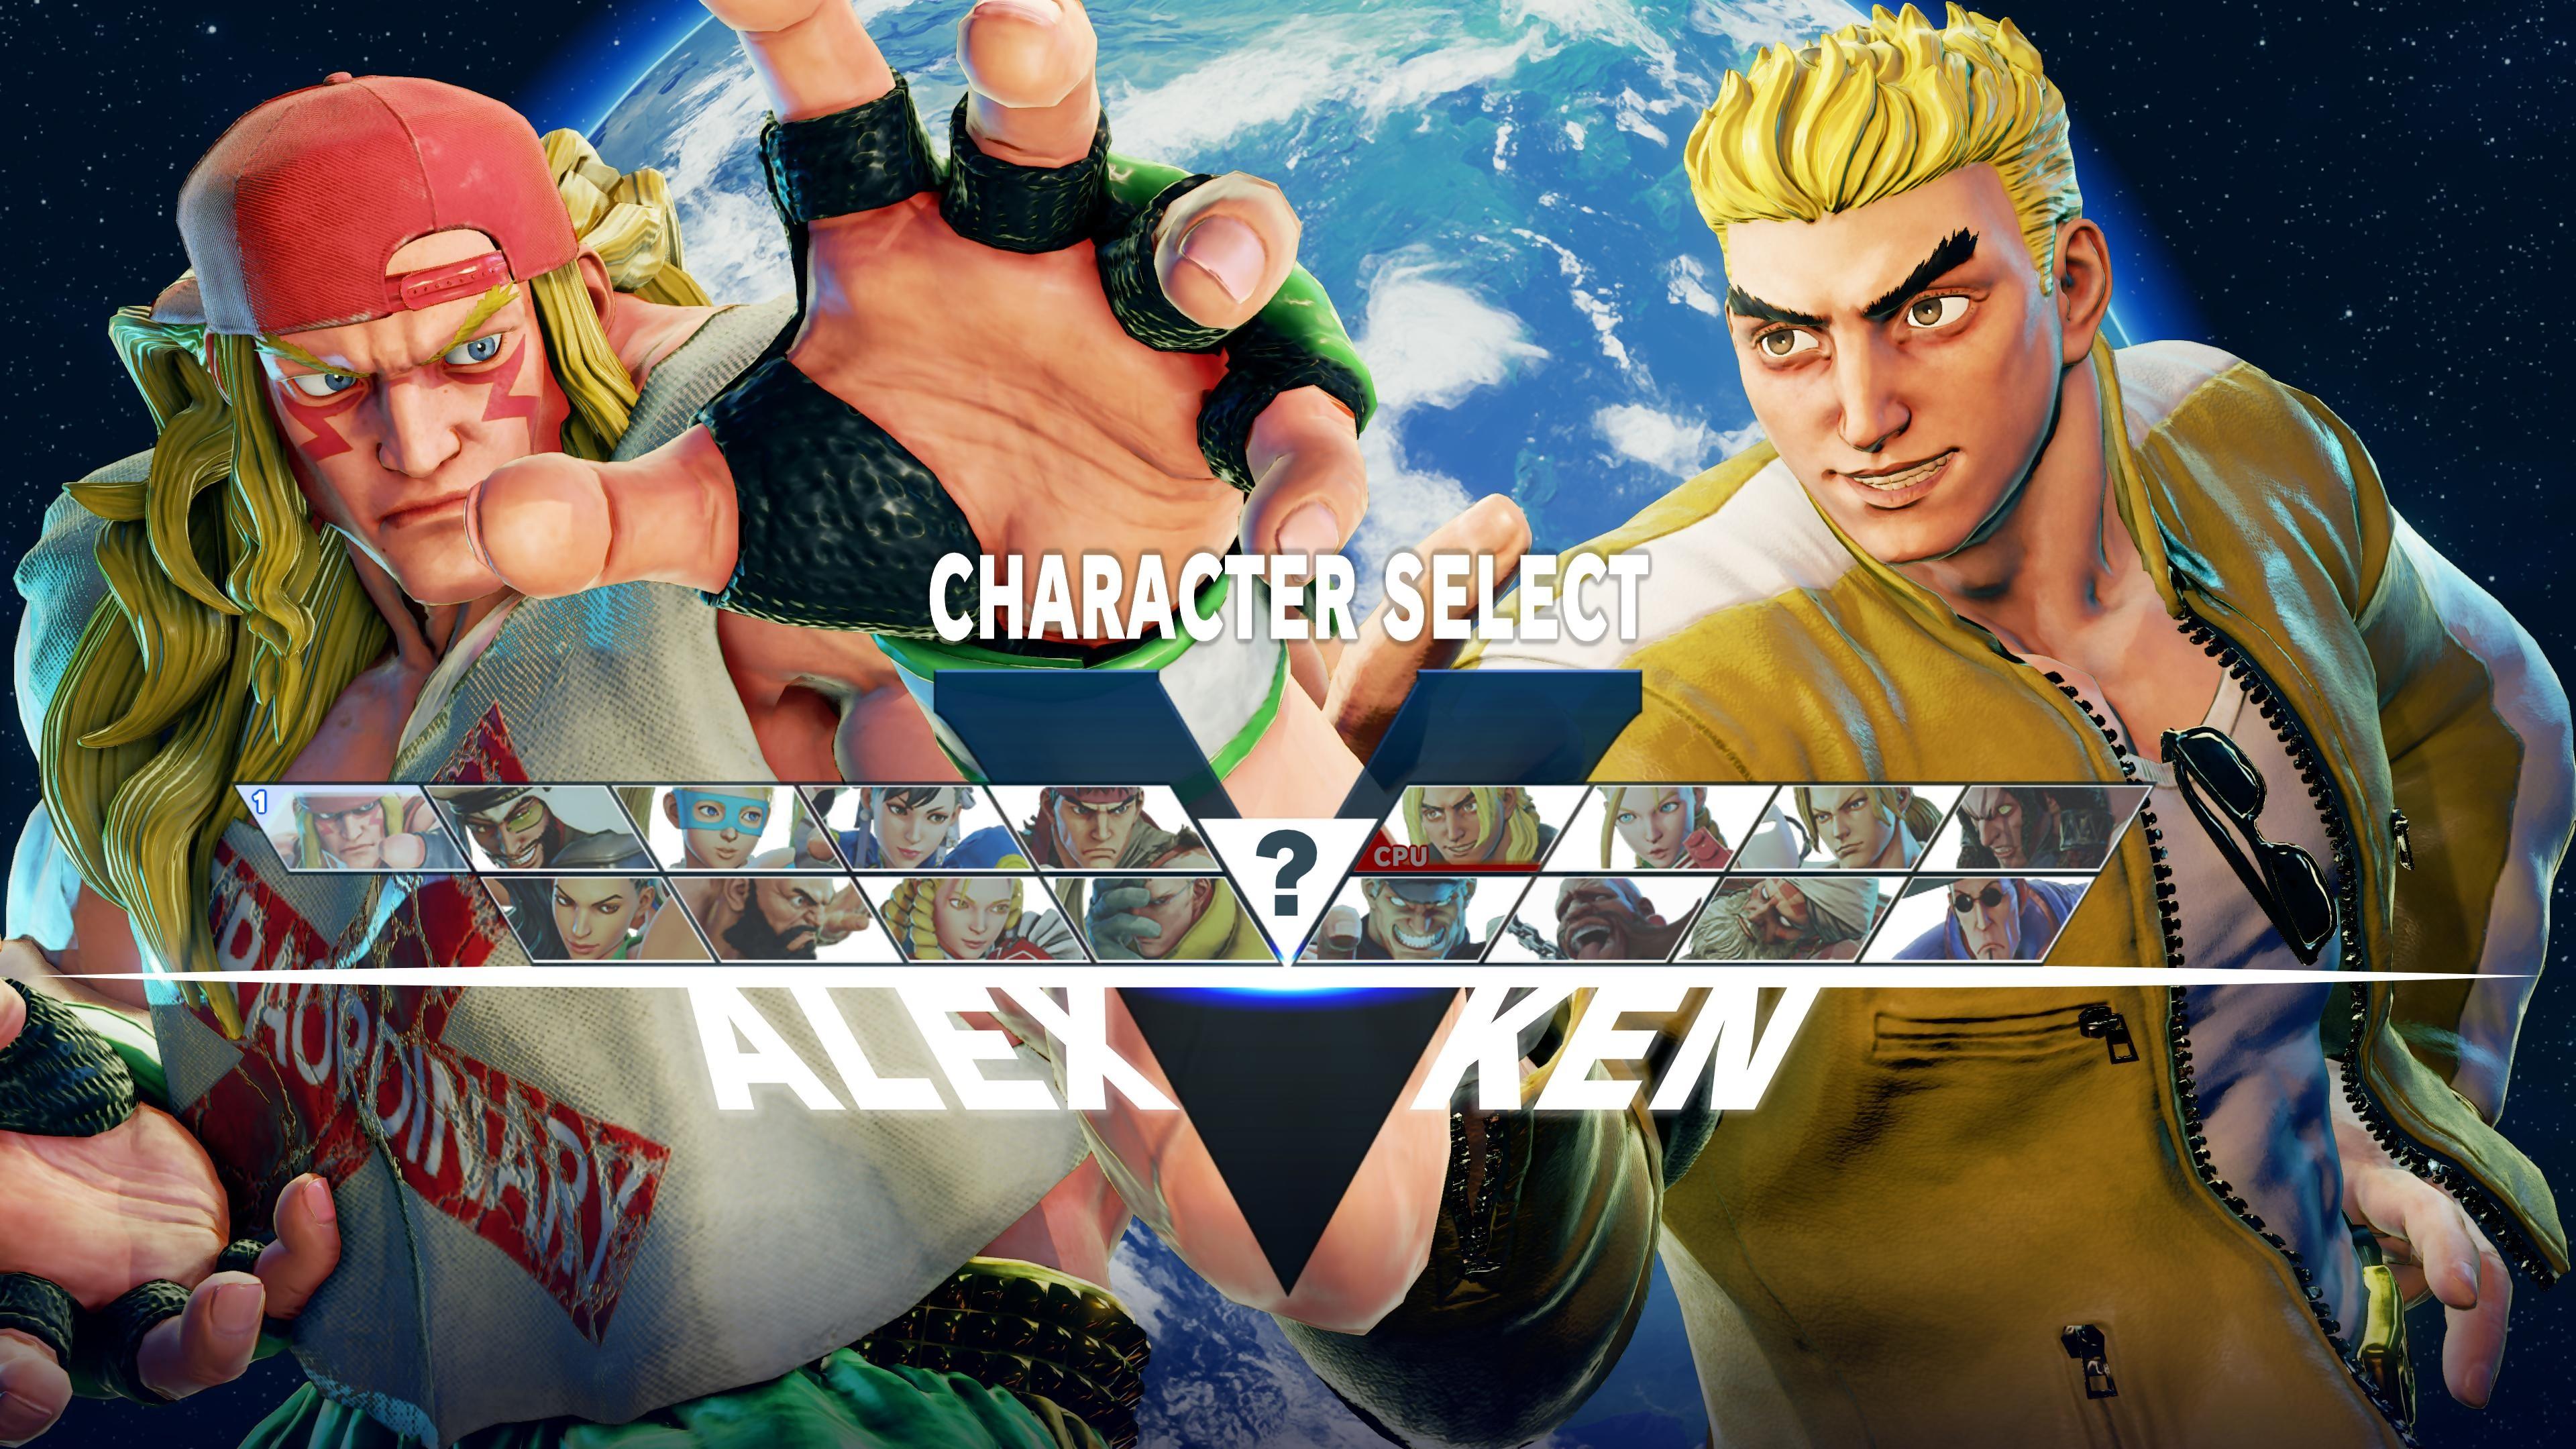 Le Messie revient ! Street Fighter V est annoncé  - Page 25 Street-fighter-5-56fae9587cba7